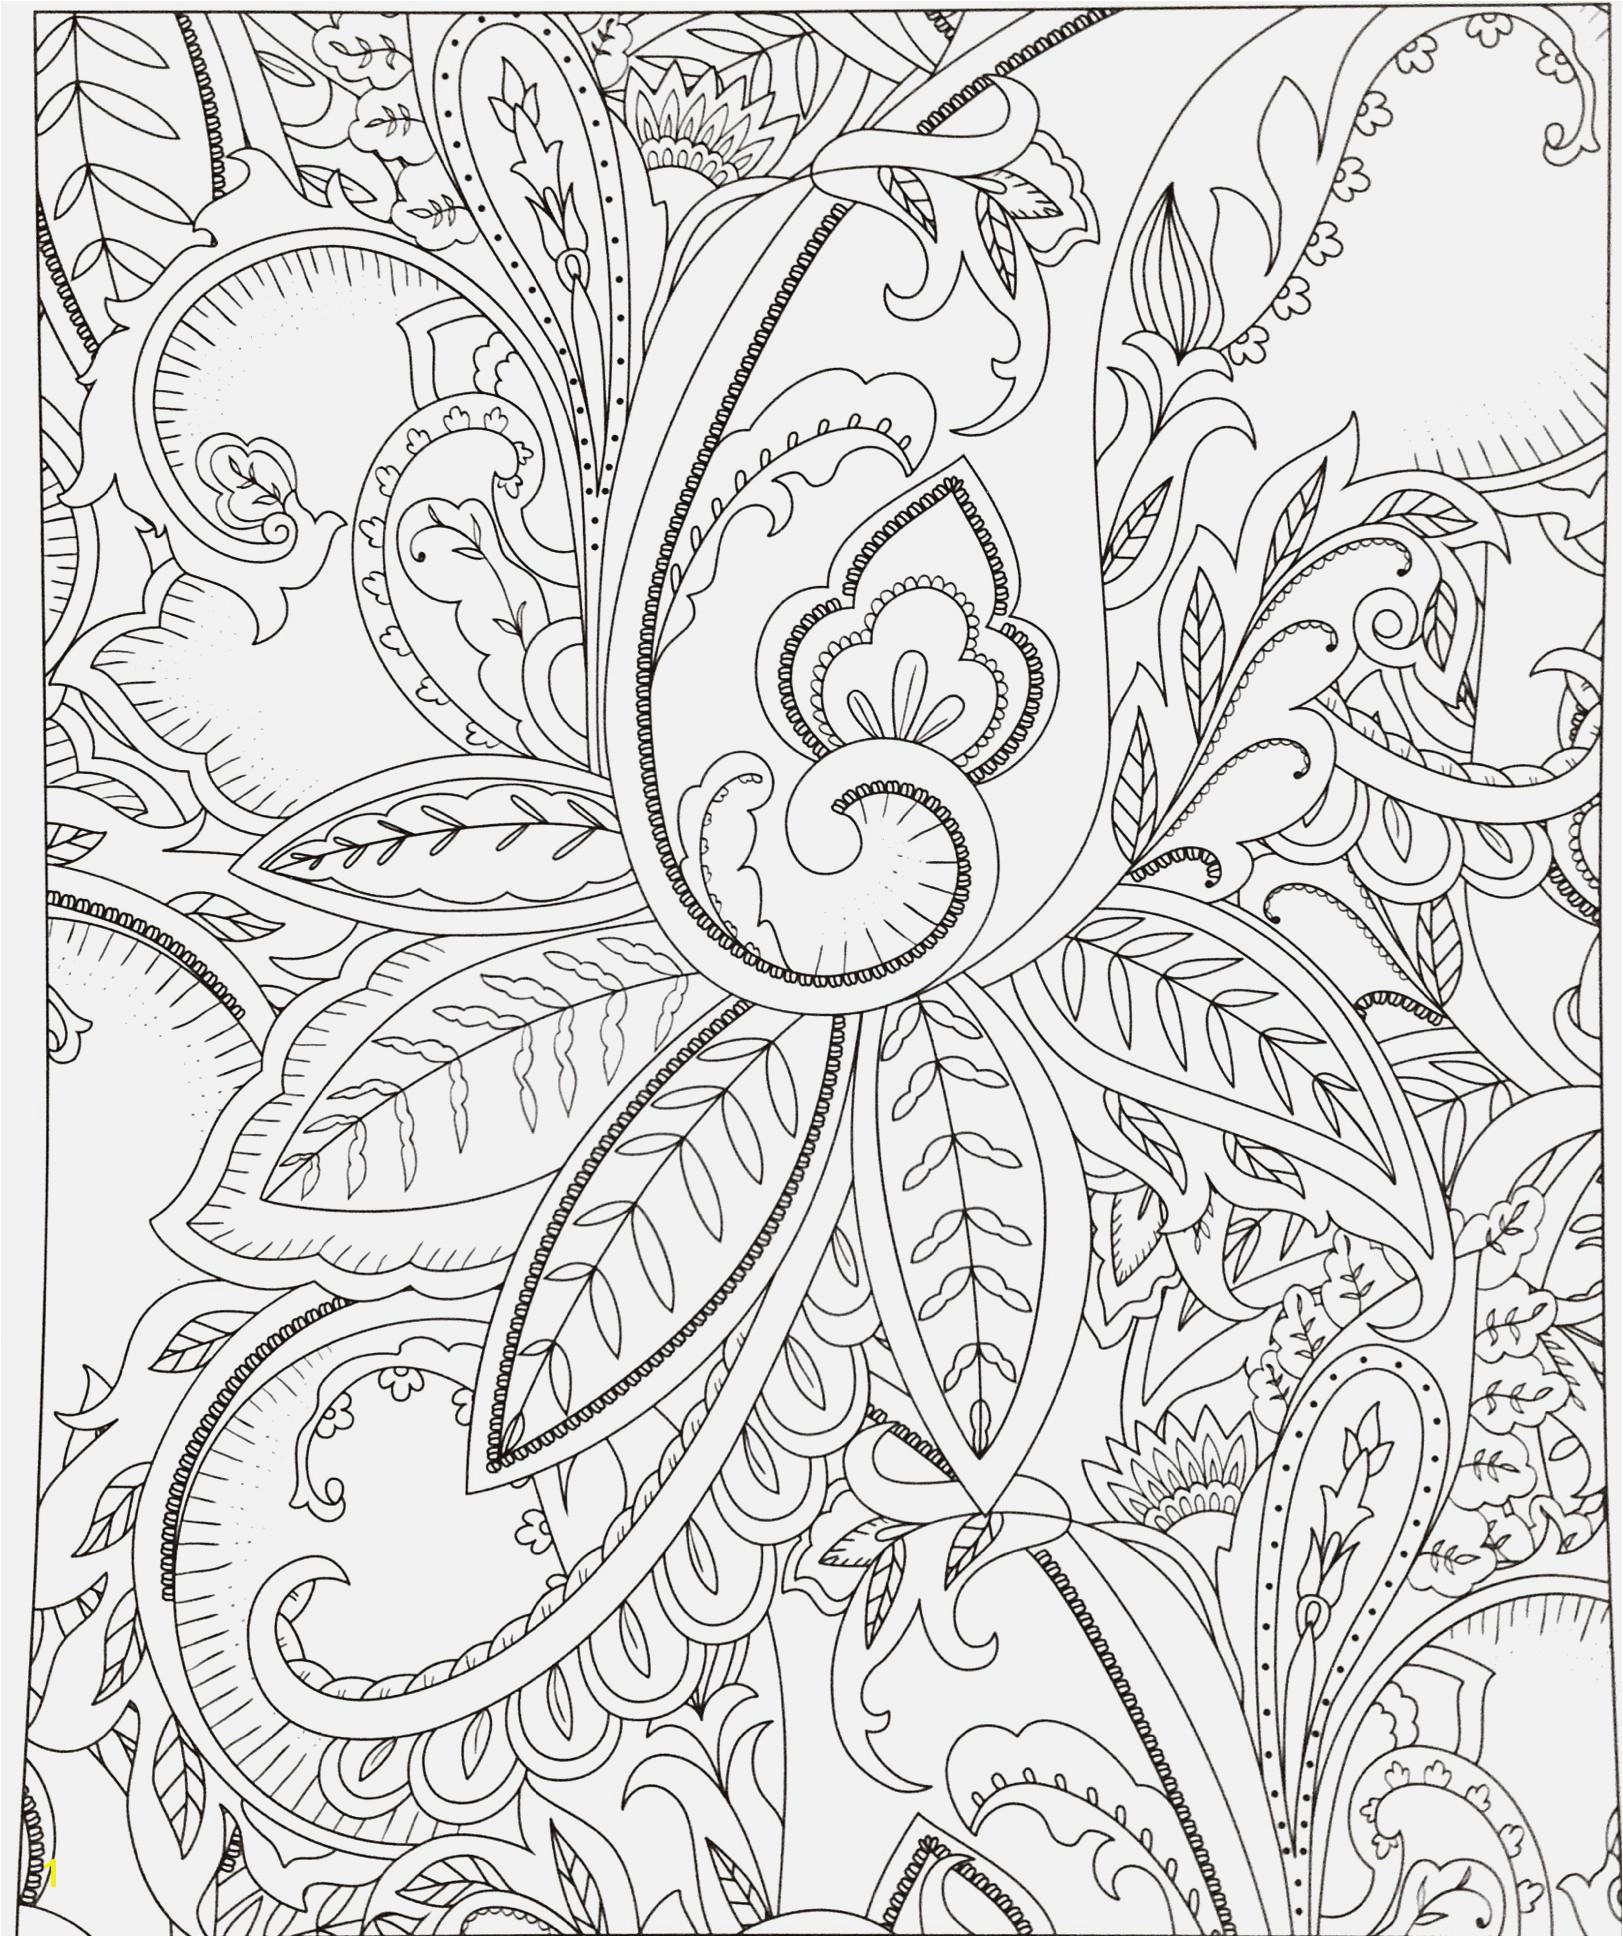 Kawaii Coloring Pages Free Printable New Kawaii Coloring Pages Od Fruits Coloring4free Coloring4free Kawaii Coloring